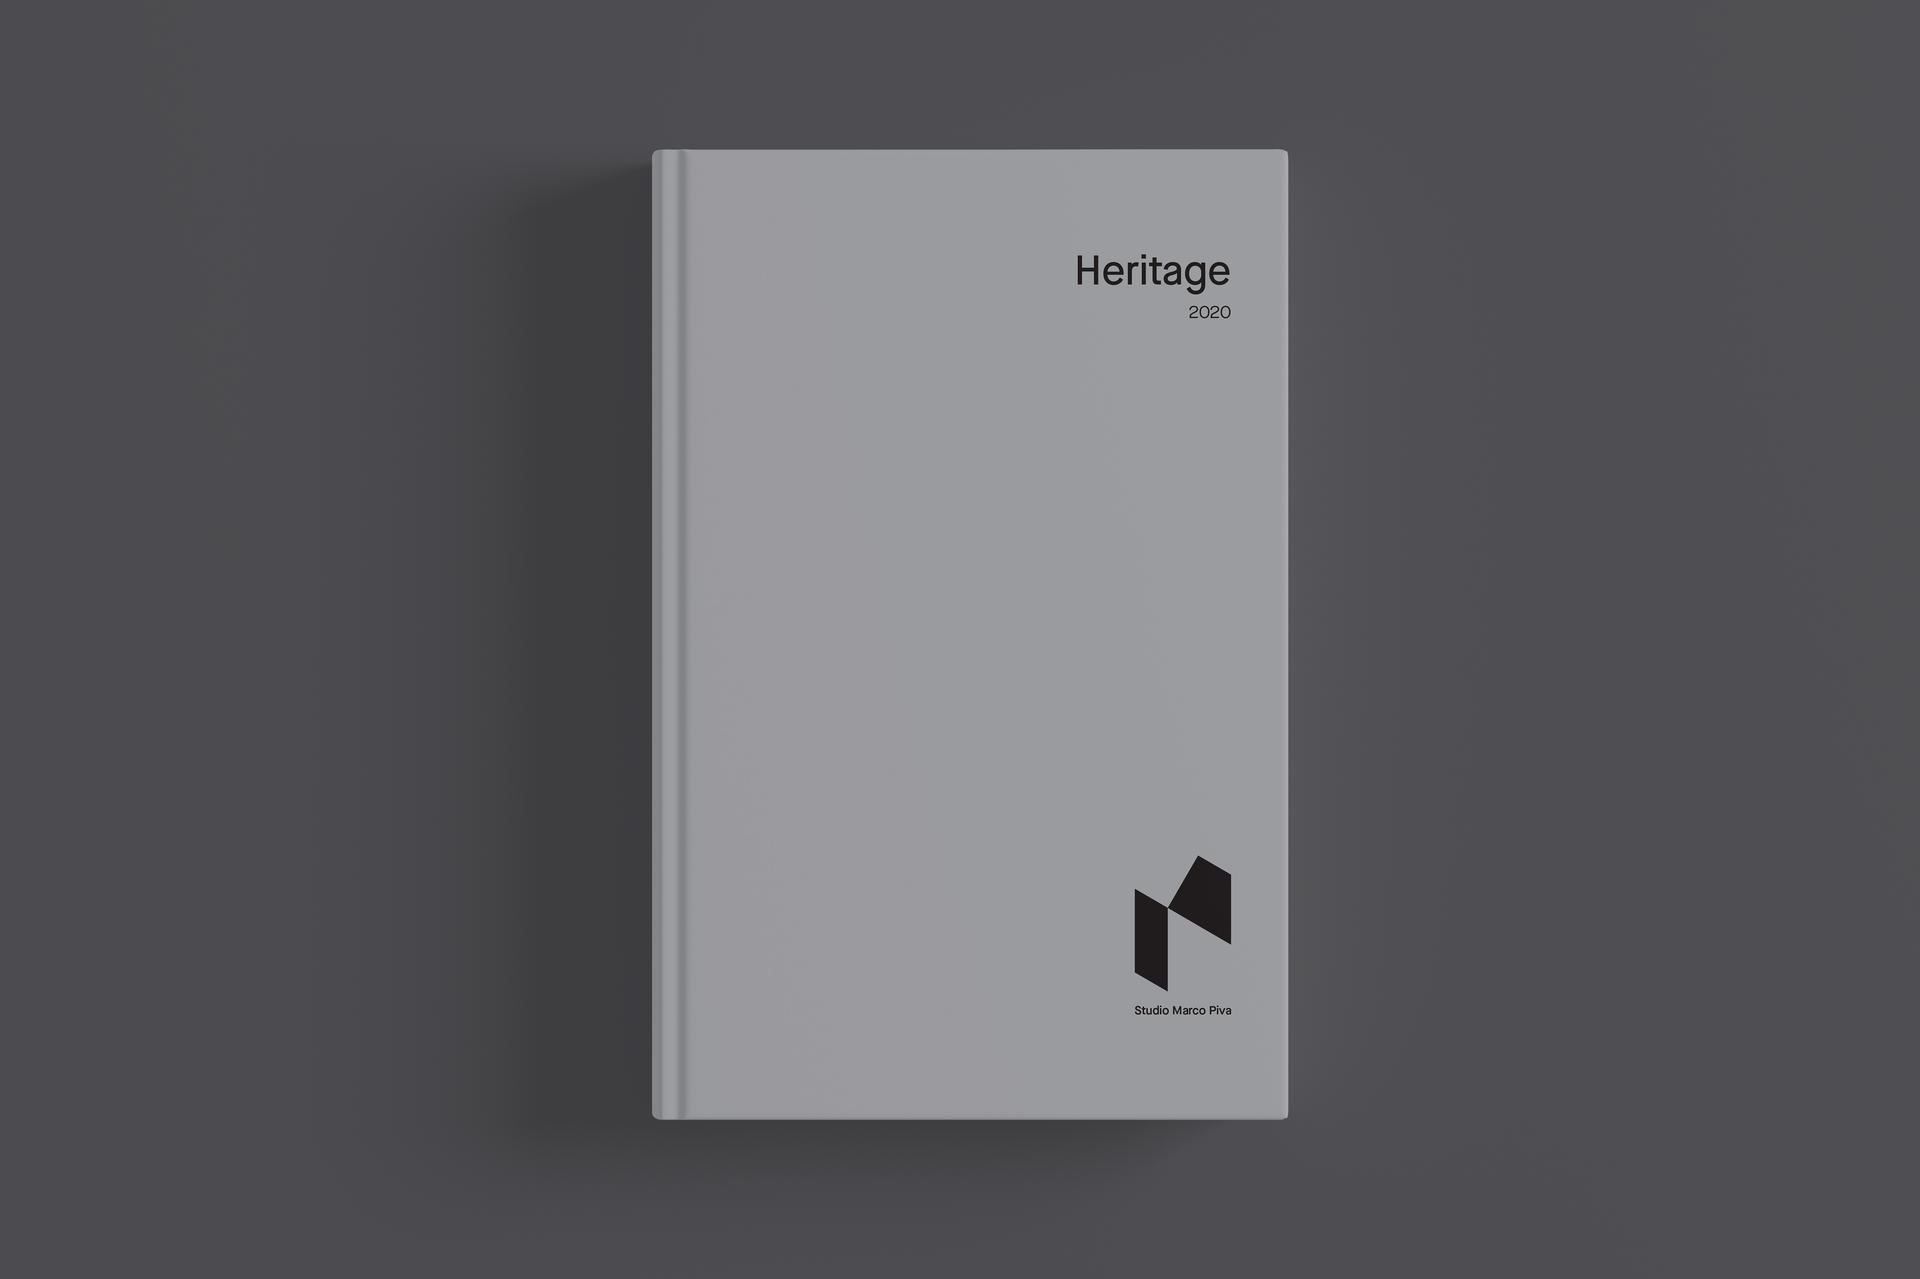 Heritage volume by Studio Marco Piva